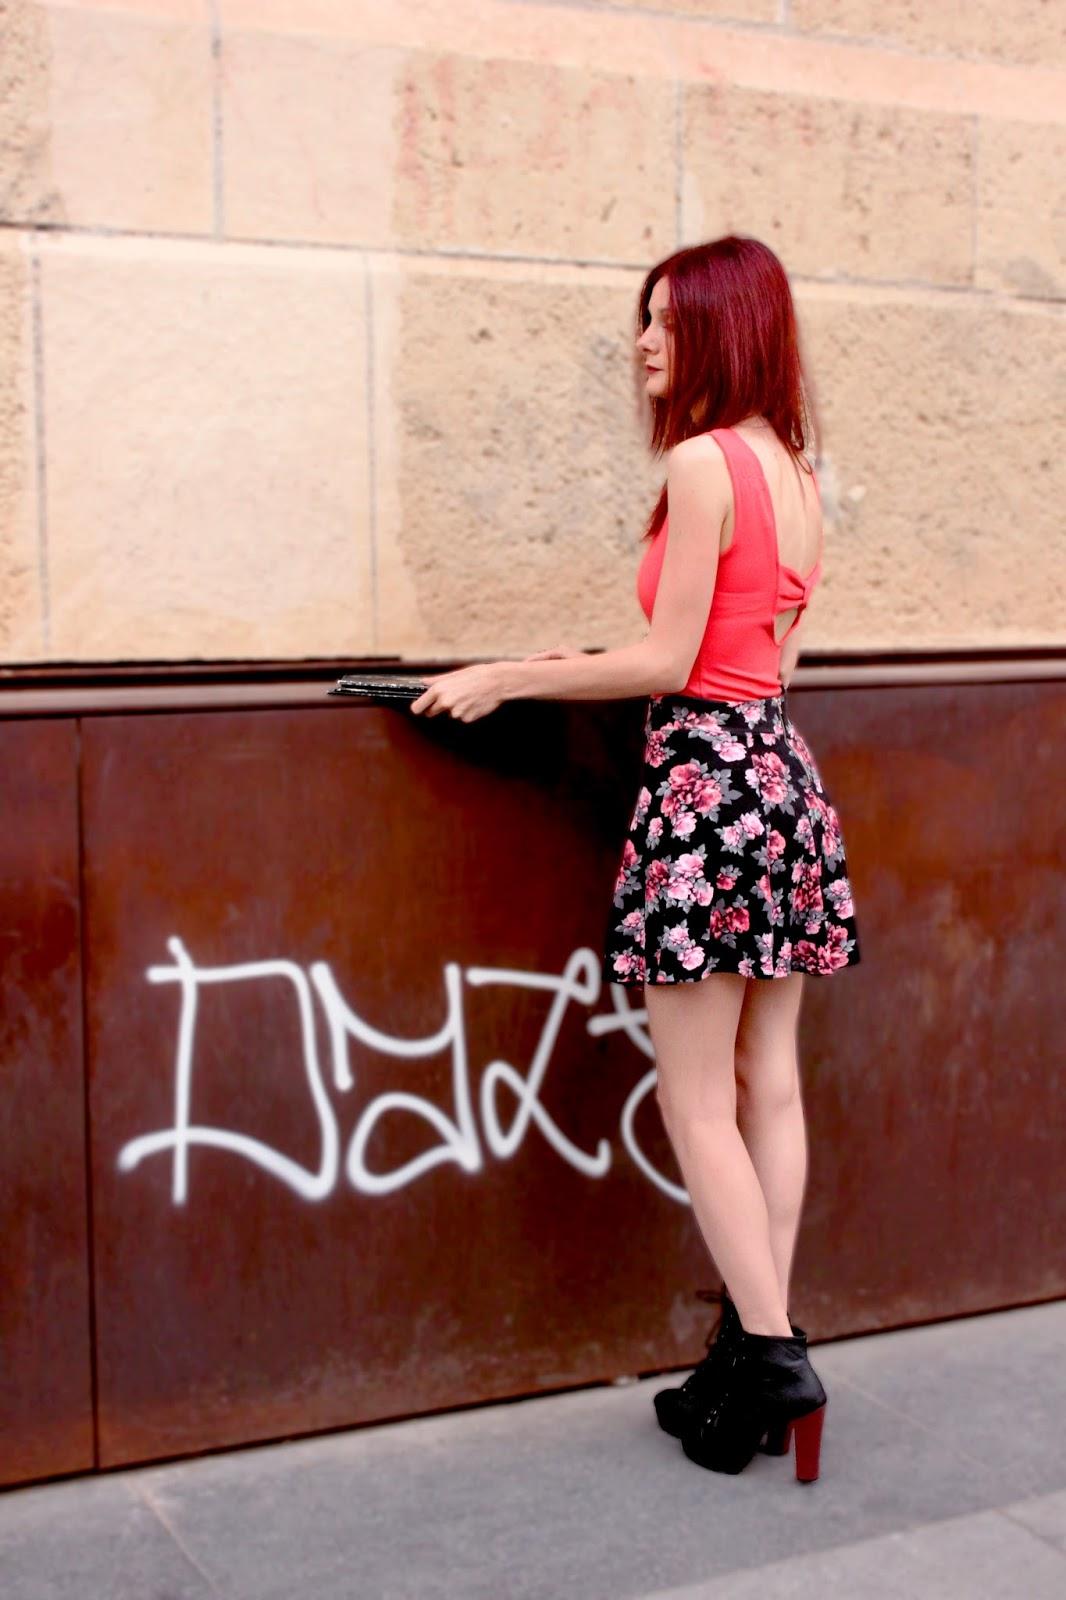 falda-skater-floral-coral-h&m-verano